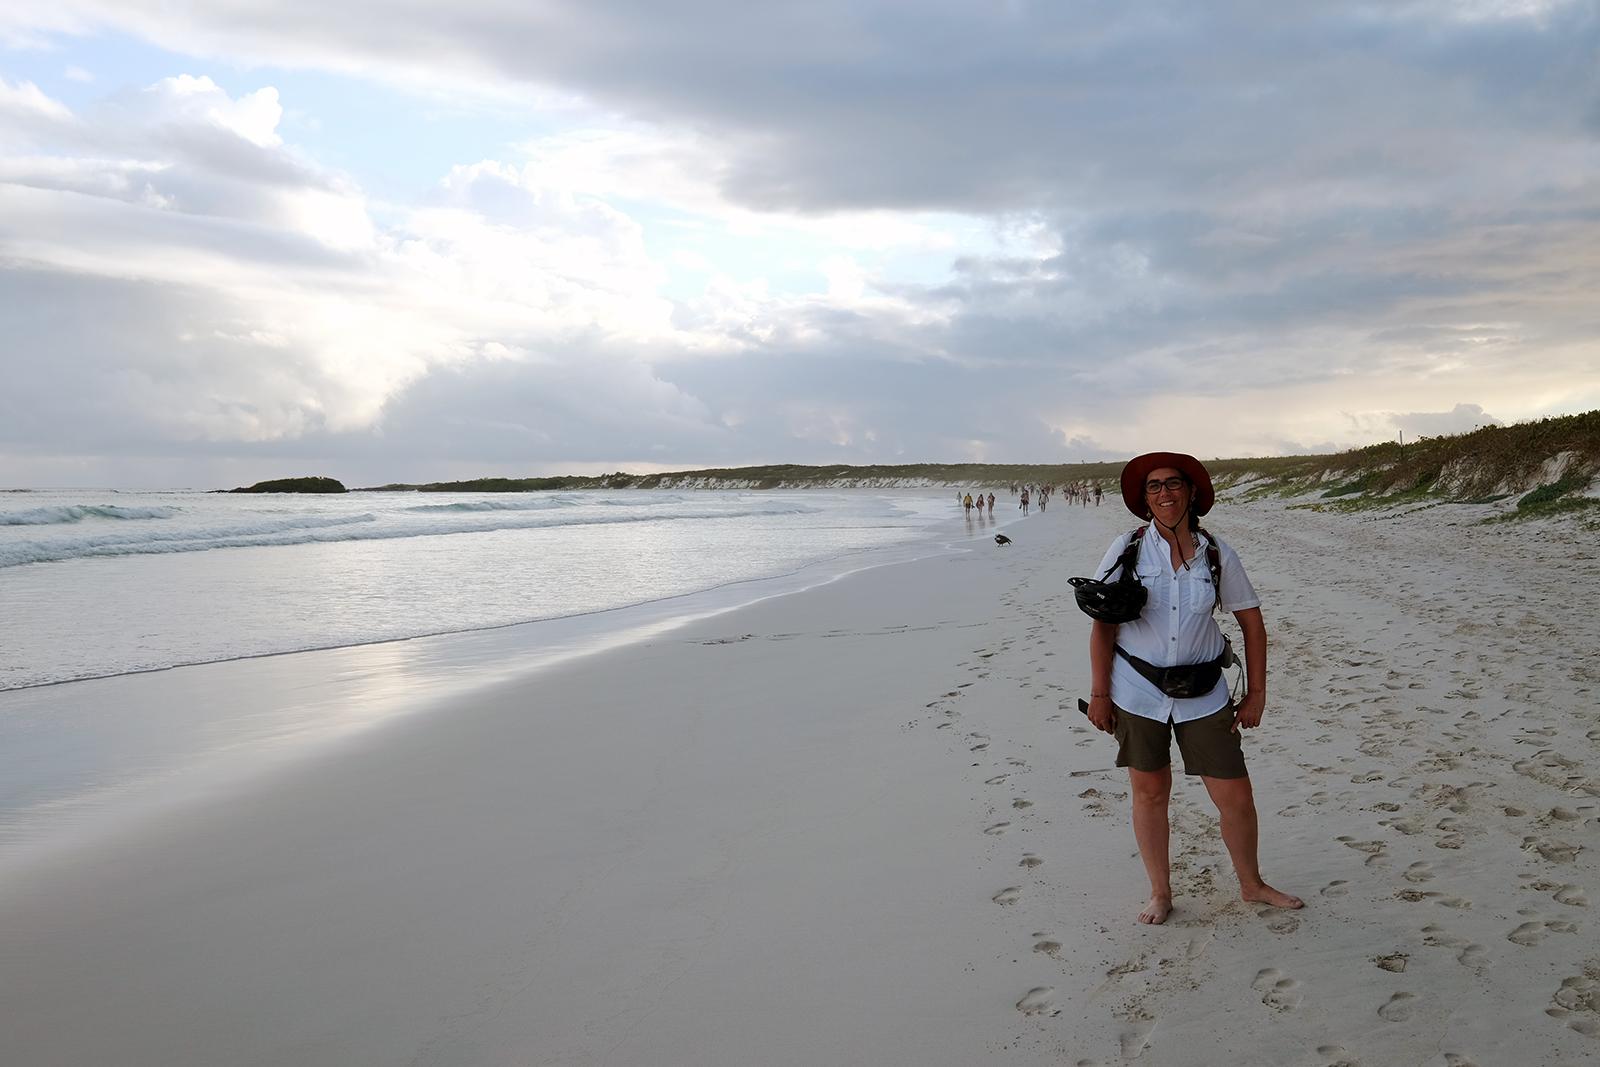 04_Playa_Bahia_de_Tortuga_10_lo_juimo.JPG